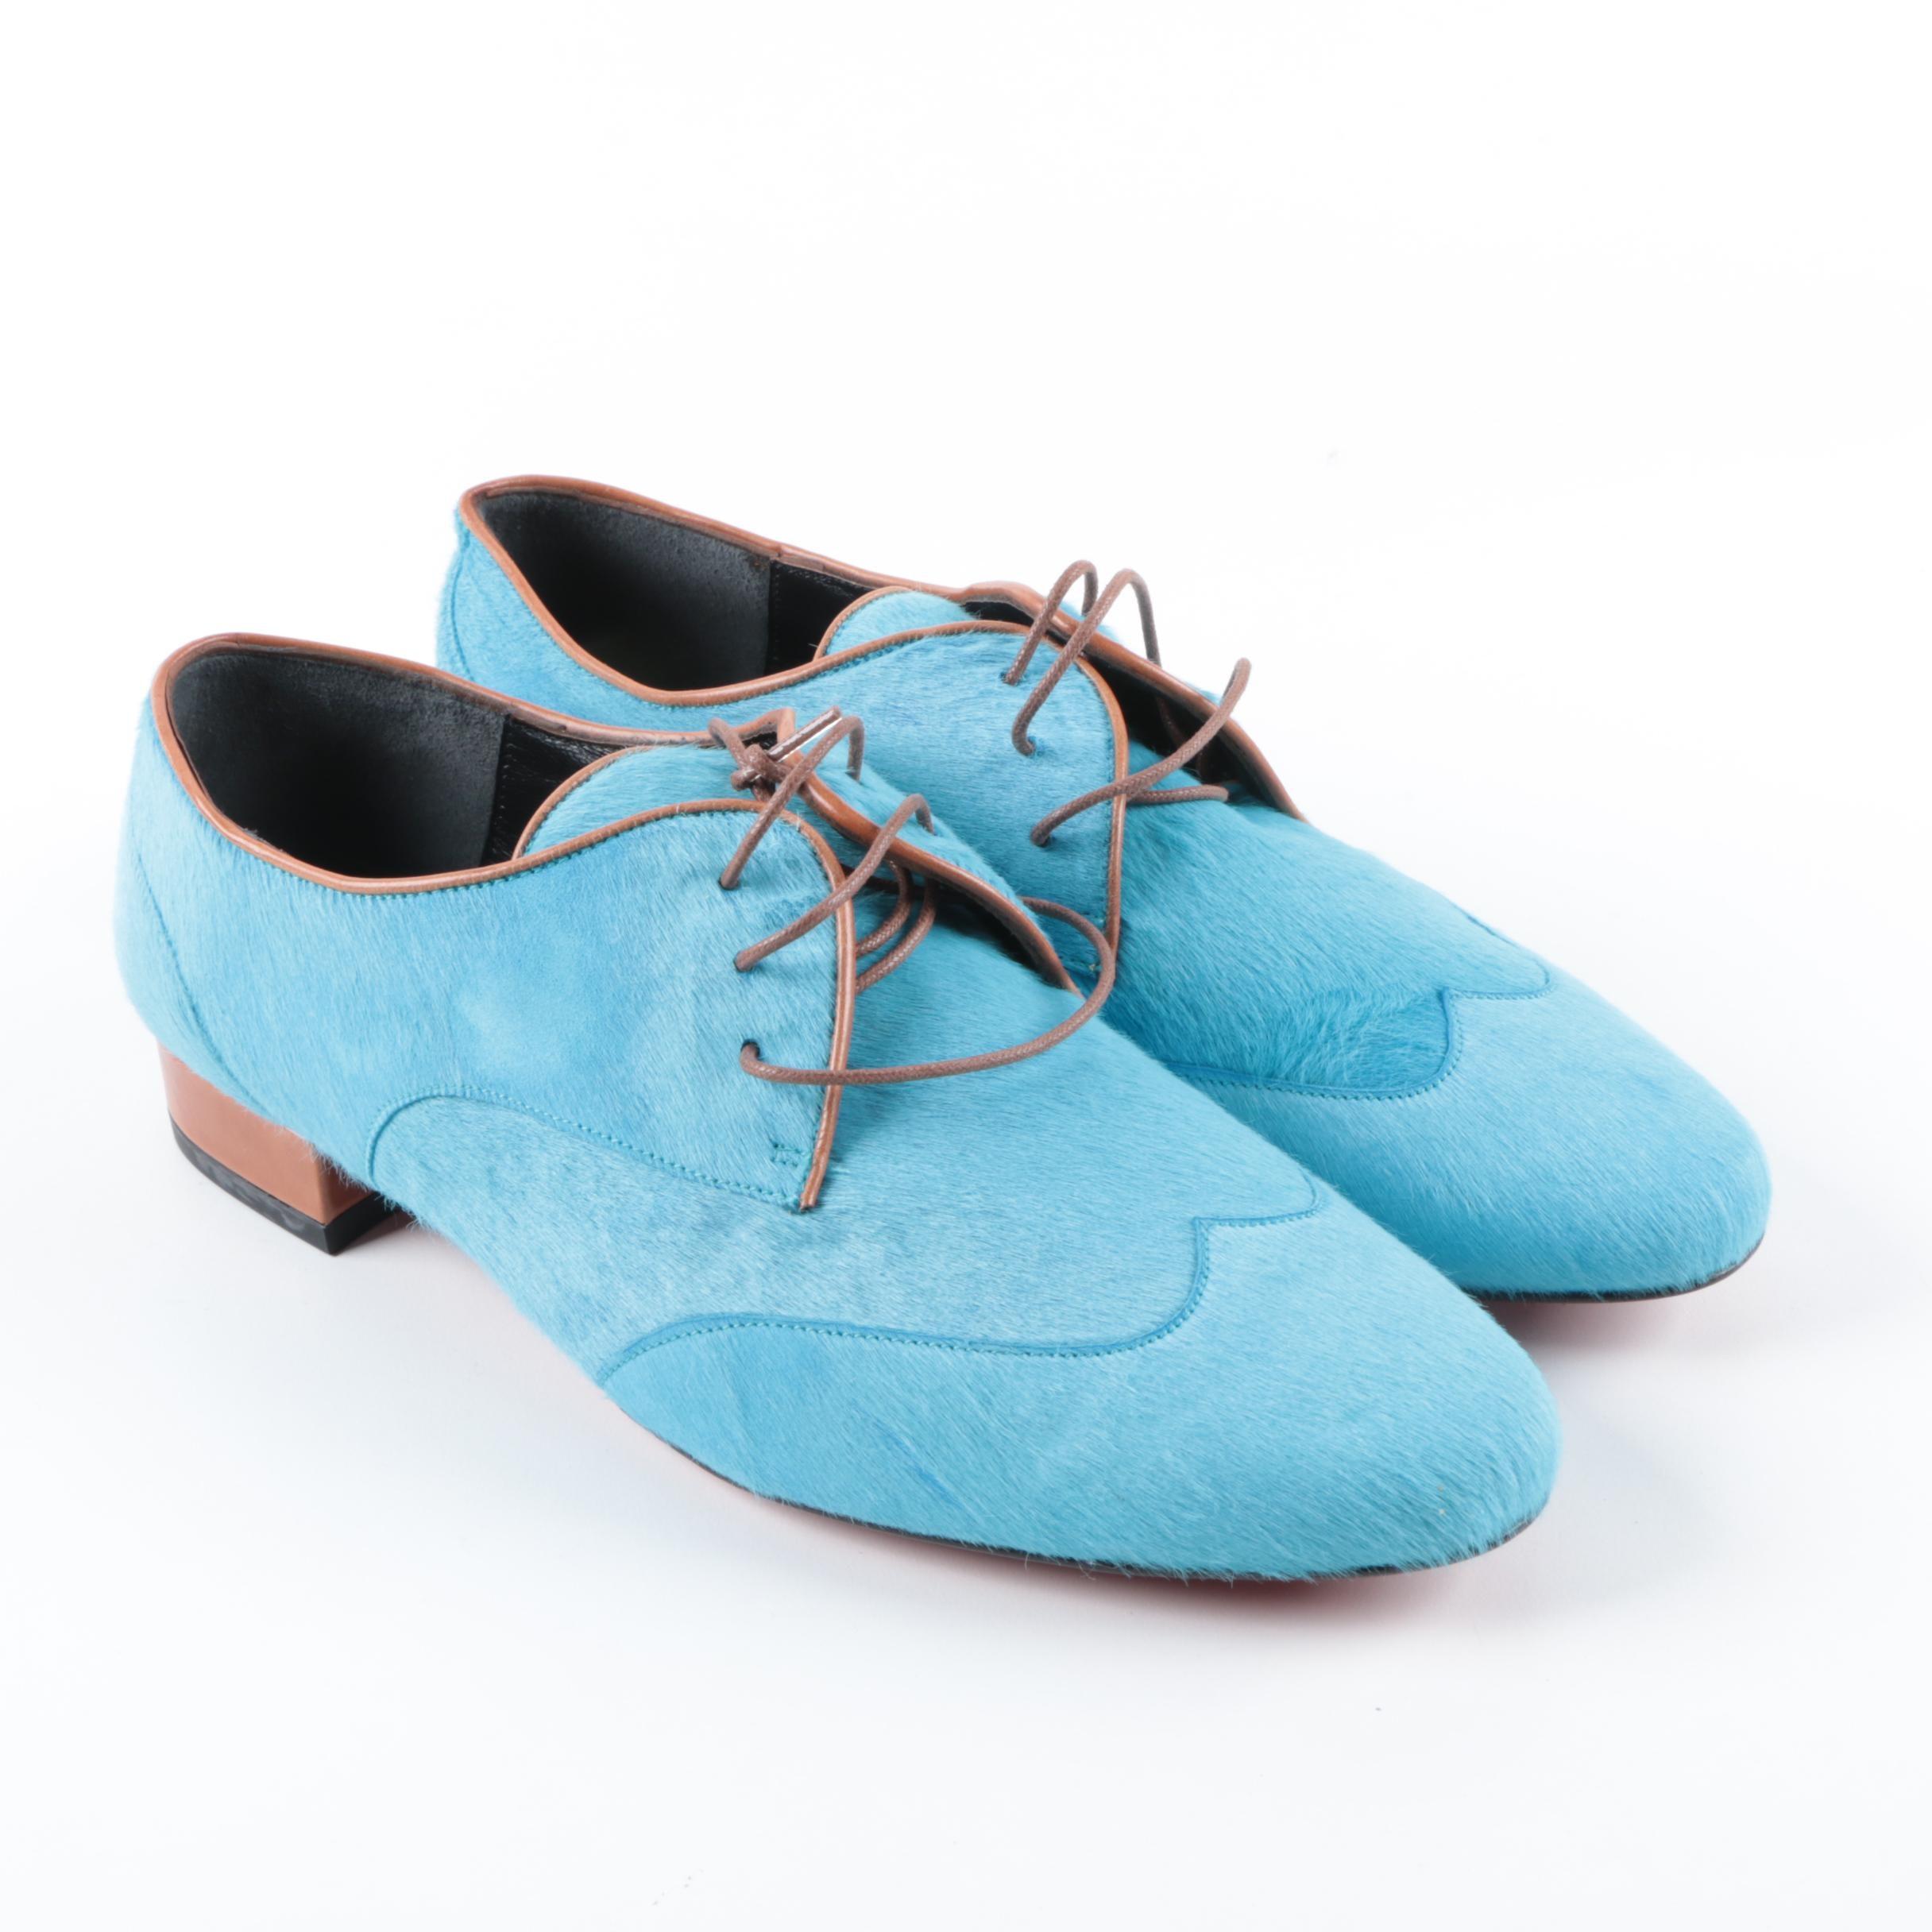 Serena Whitehaven Aqua Blue Pony Hair Wingtip Shoes